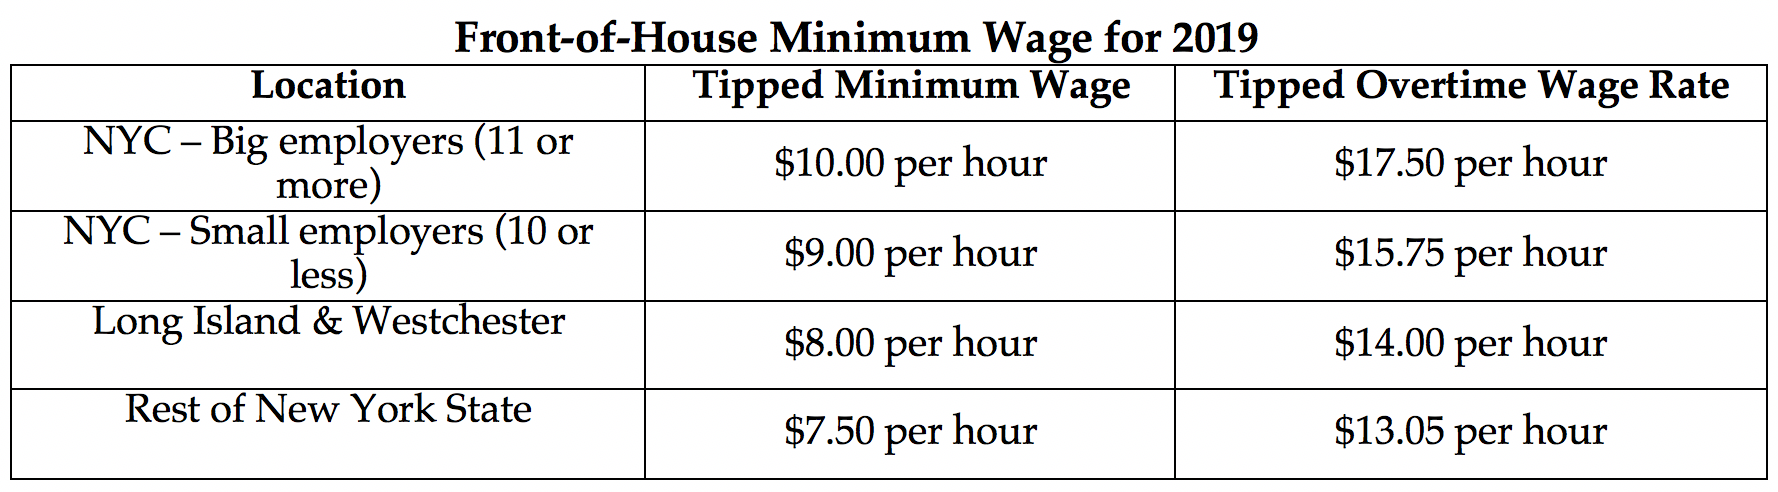 New York Minimum Wage 2019 New York Restaurant Workers Receive Minimum Wage Increase in 2019